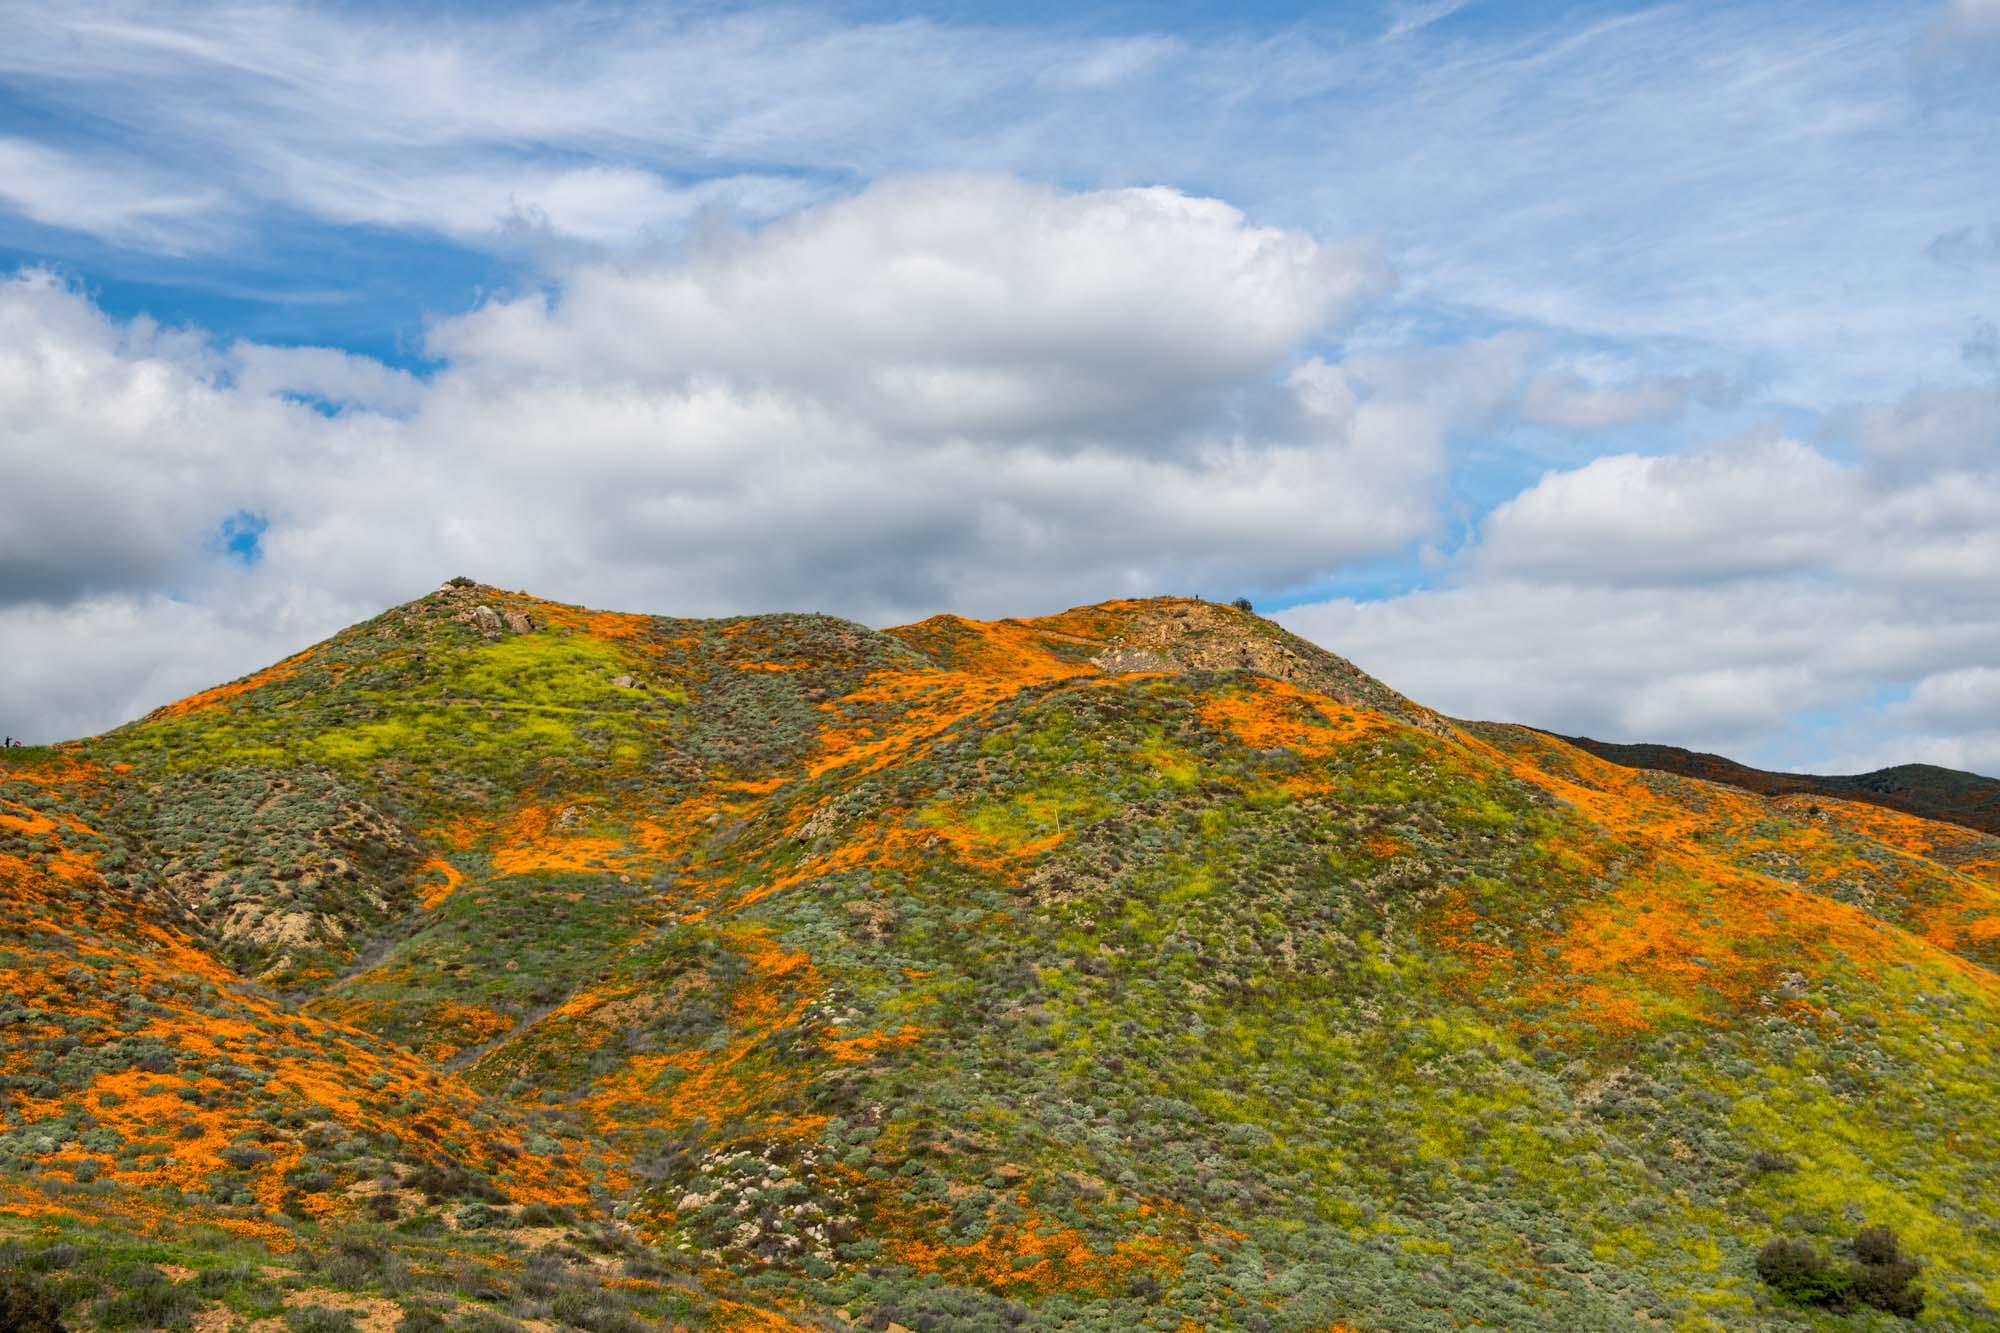 california-poppies-walker-canyon-12.jpg